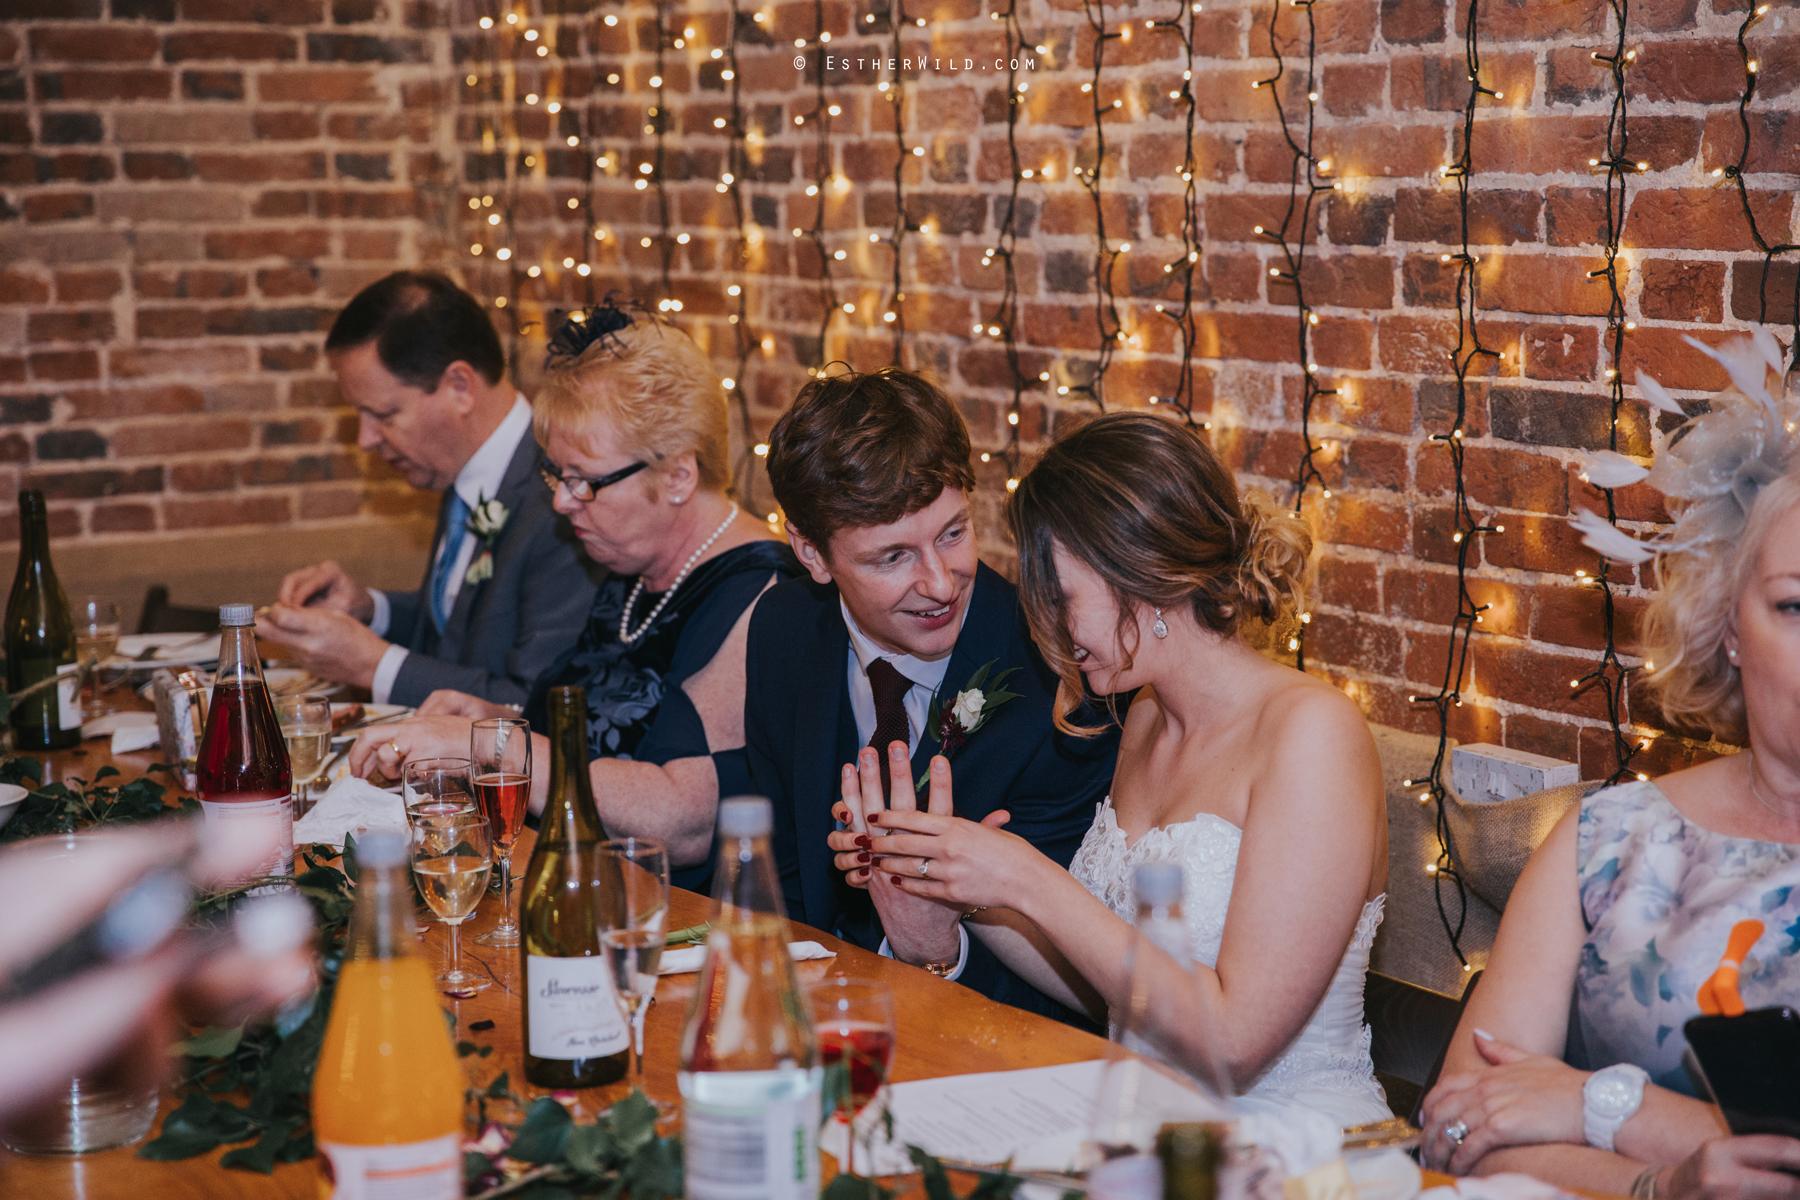 Glebe_Farm_Barn_Rustic_Norfolk_Wedding_Esther_Wild_Photographer_Copyright_IMG_2273.jpg